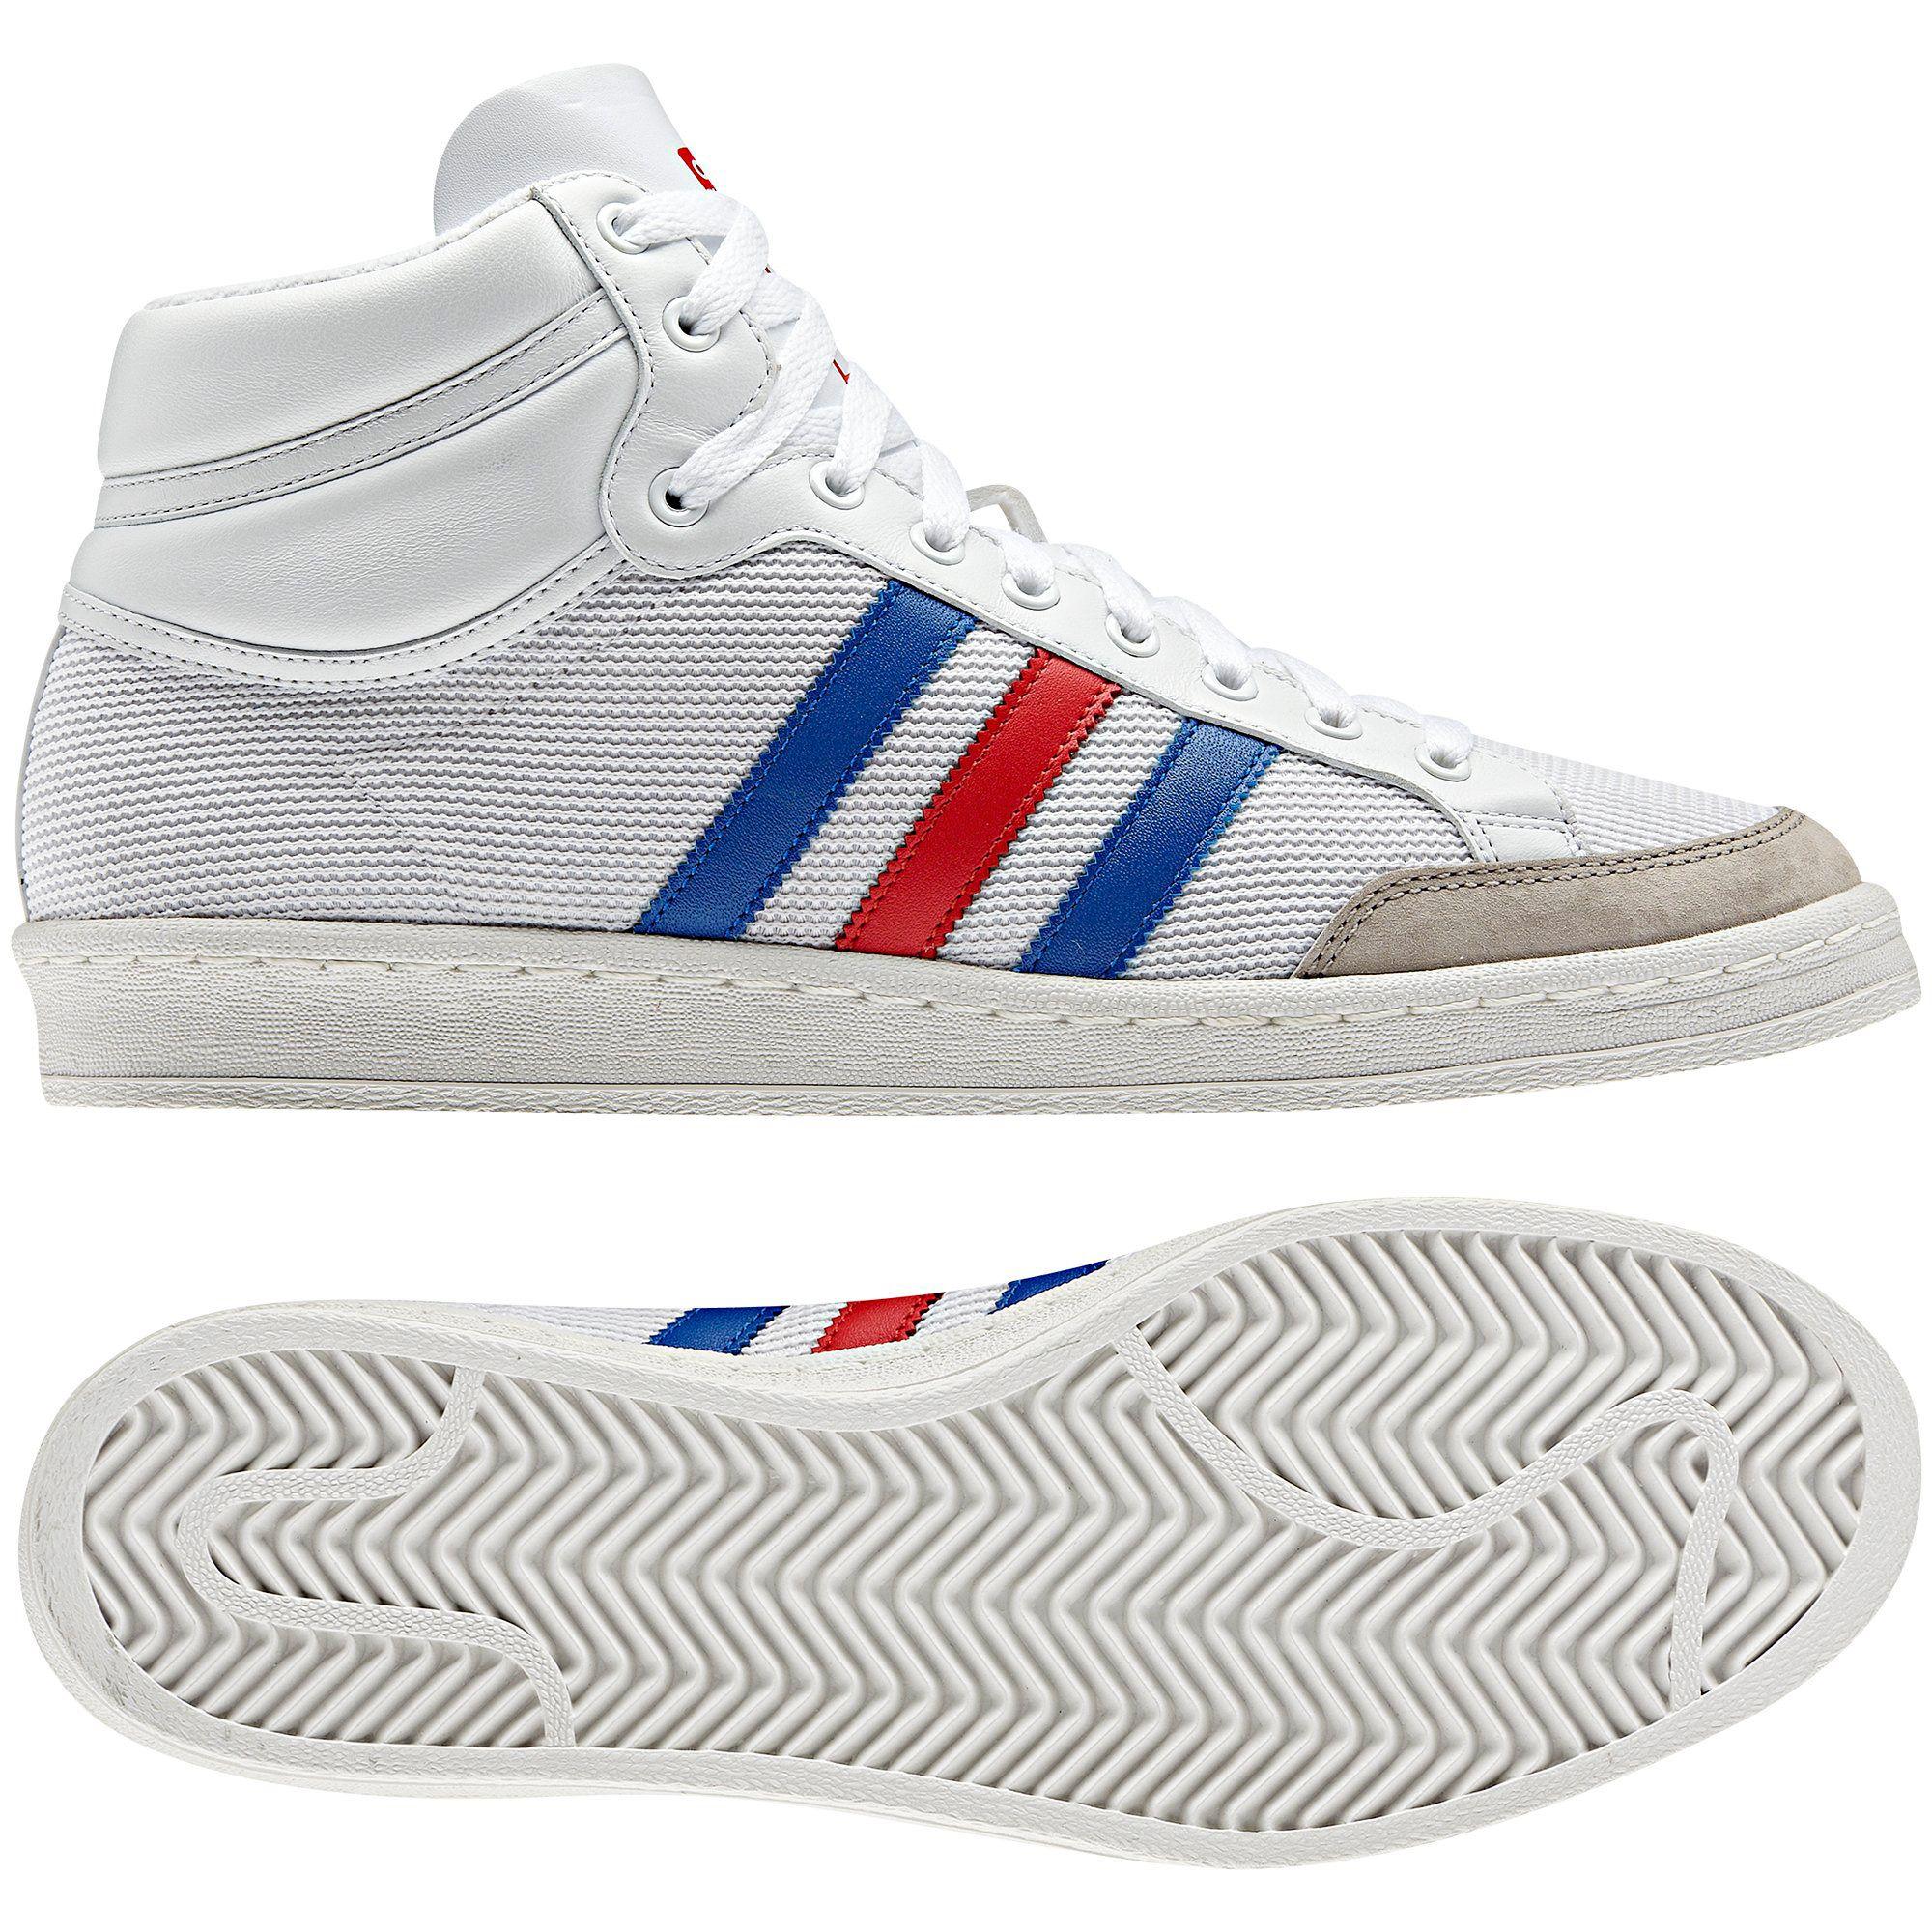 promo code b3b60 6ca8d Hommes Chaussures Americana Hi 88, running white  vivid red  true blue